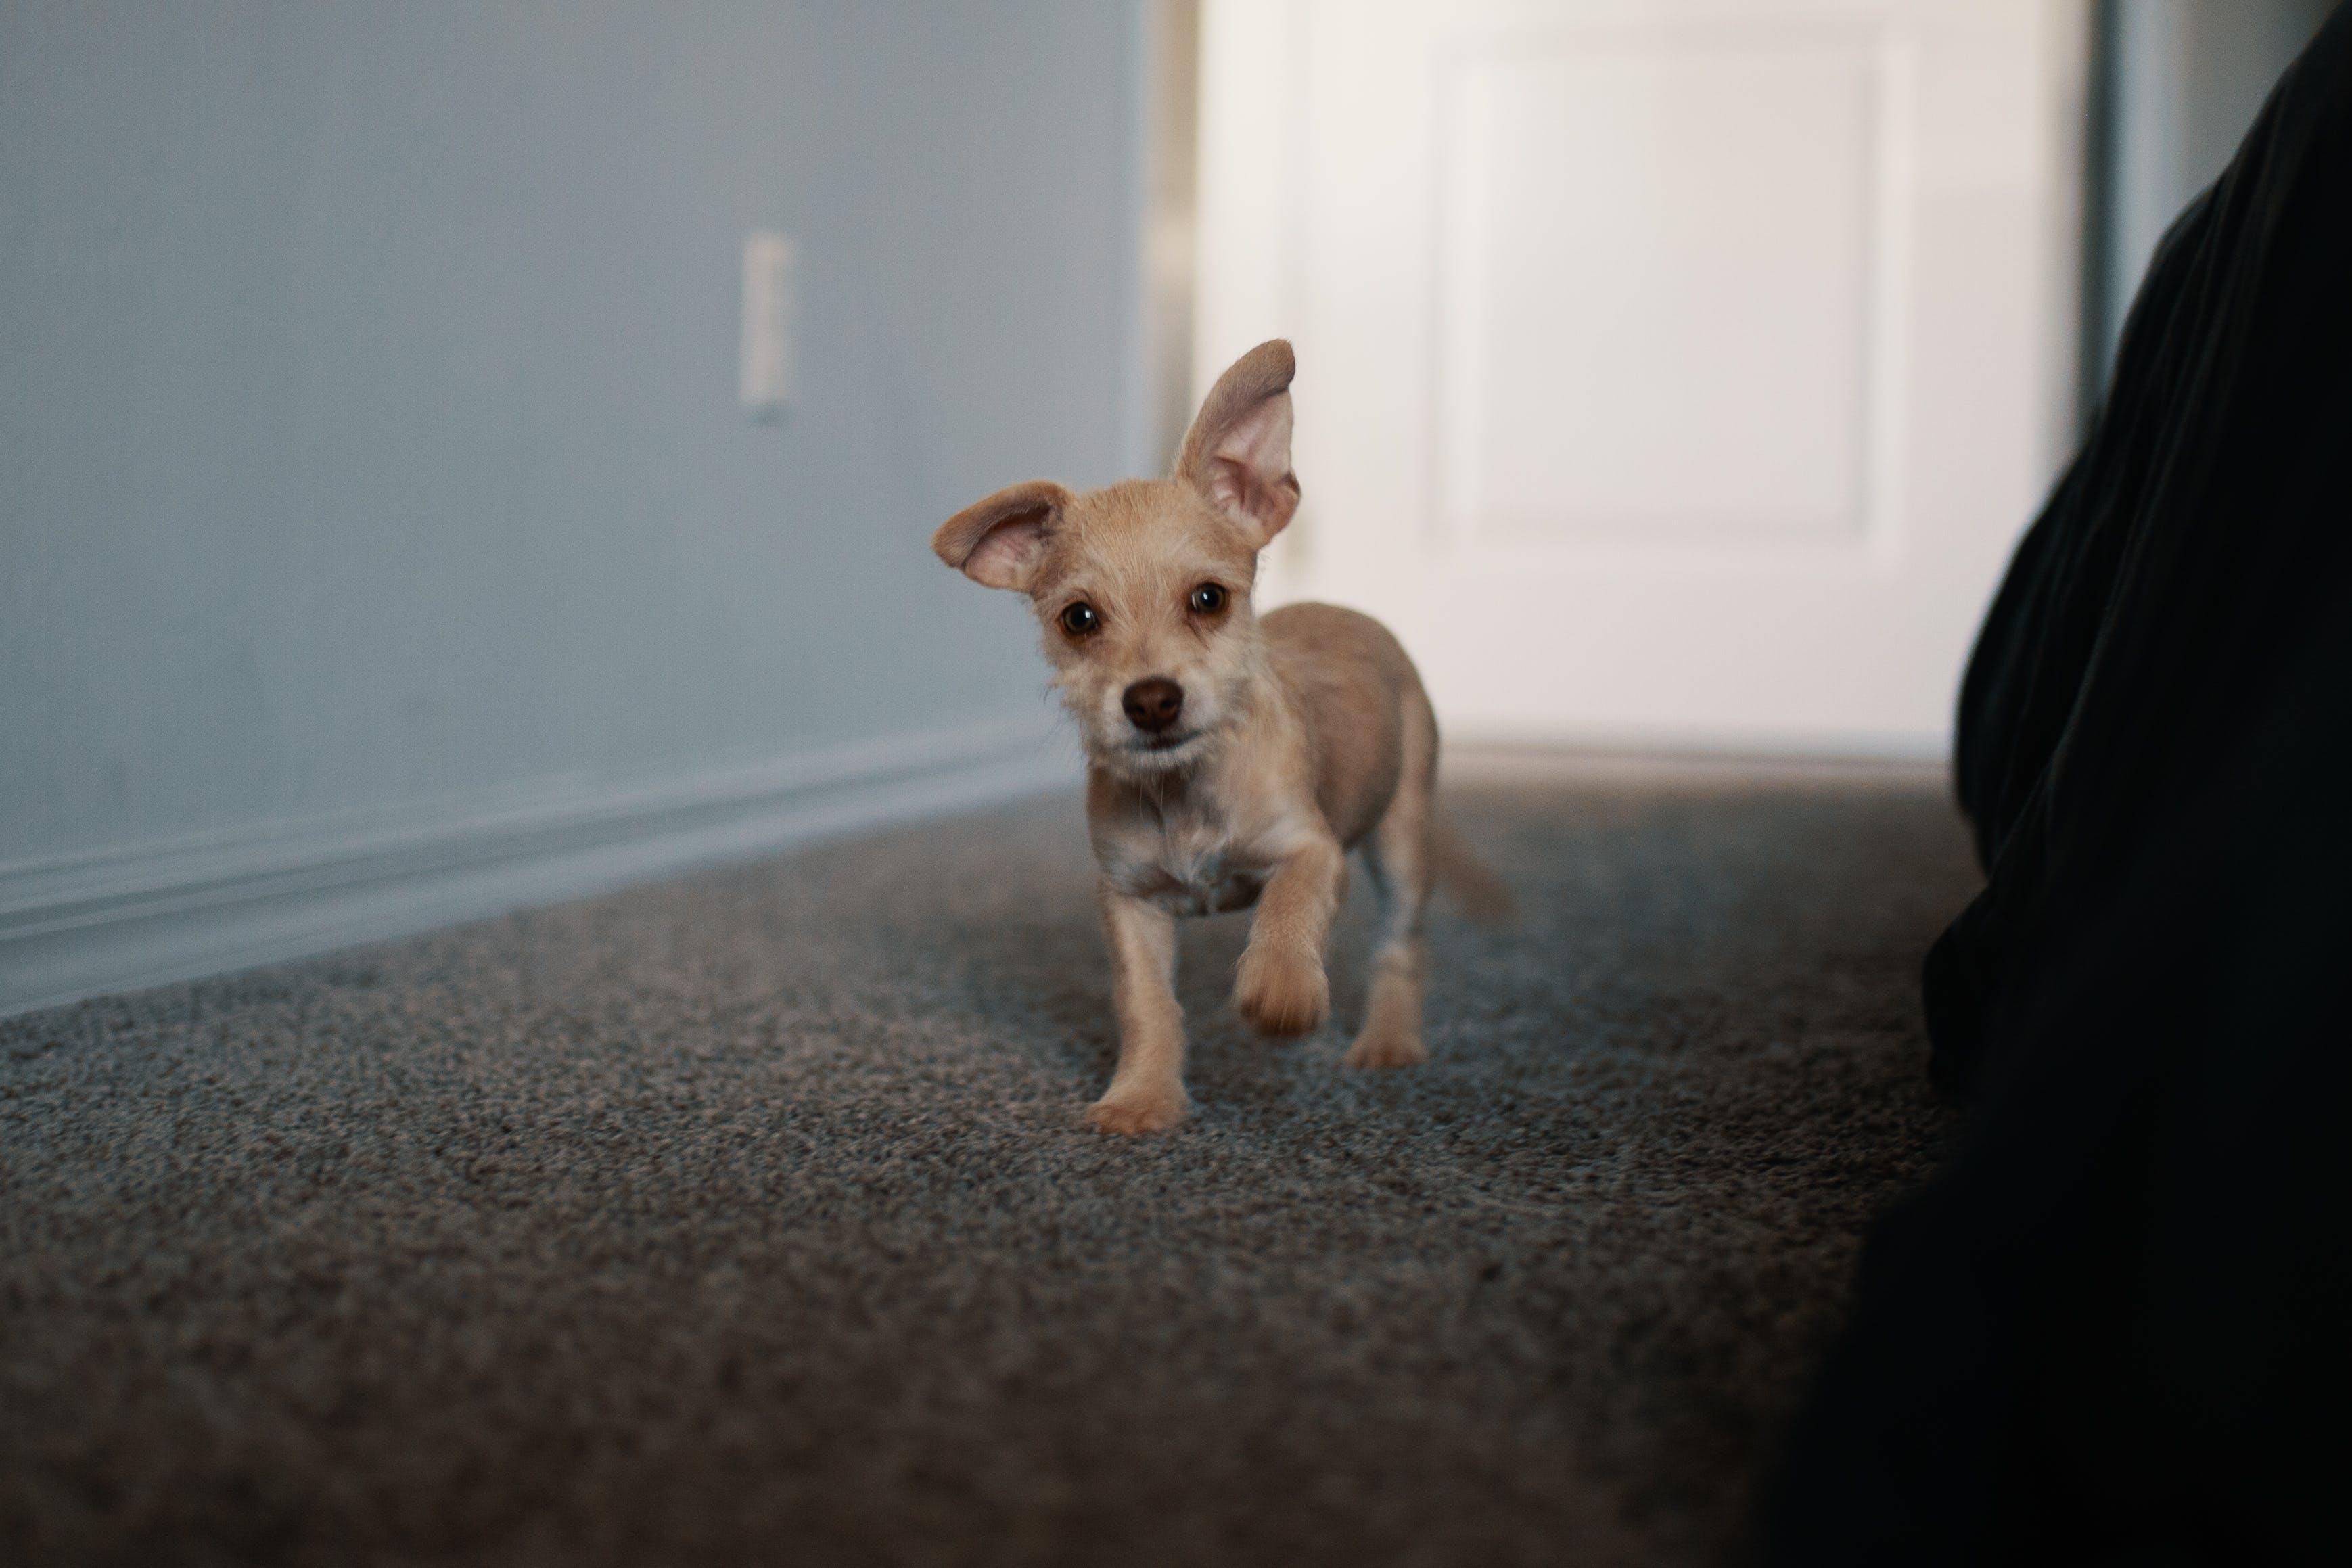 Short-coated Tan Puppy Walking on Black Carpet